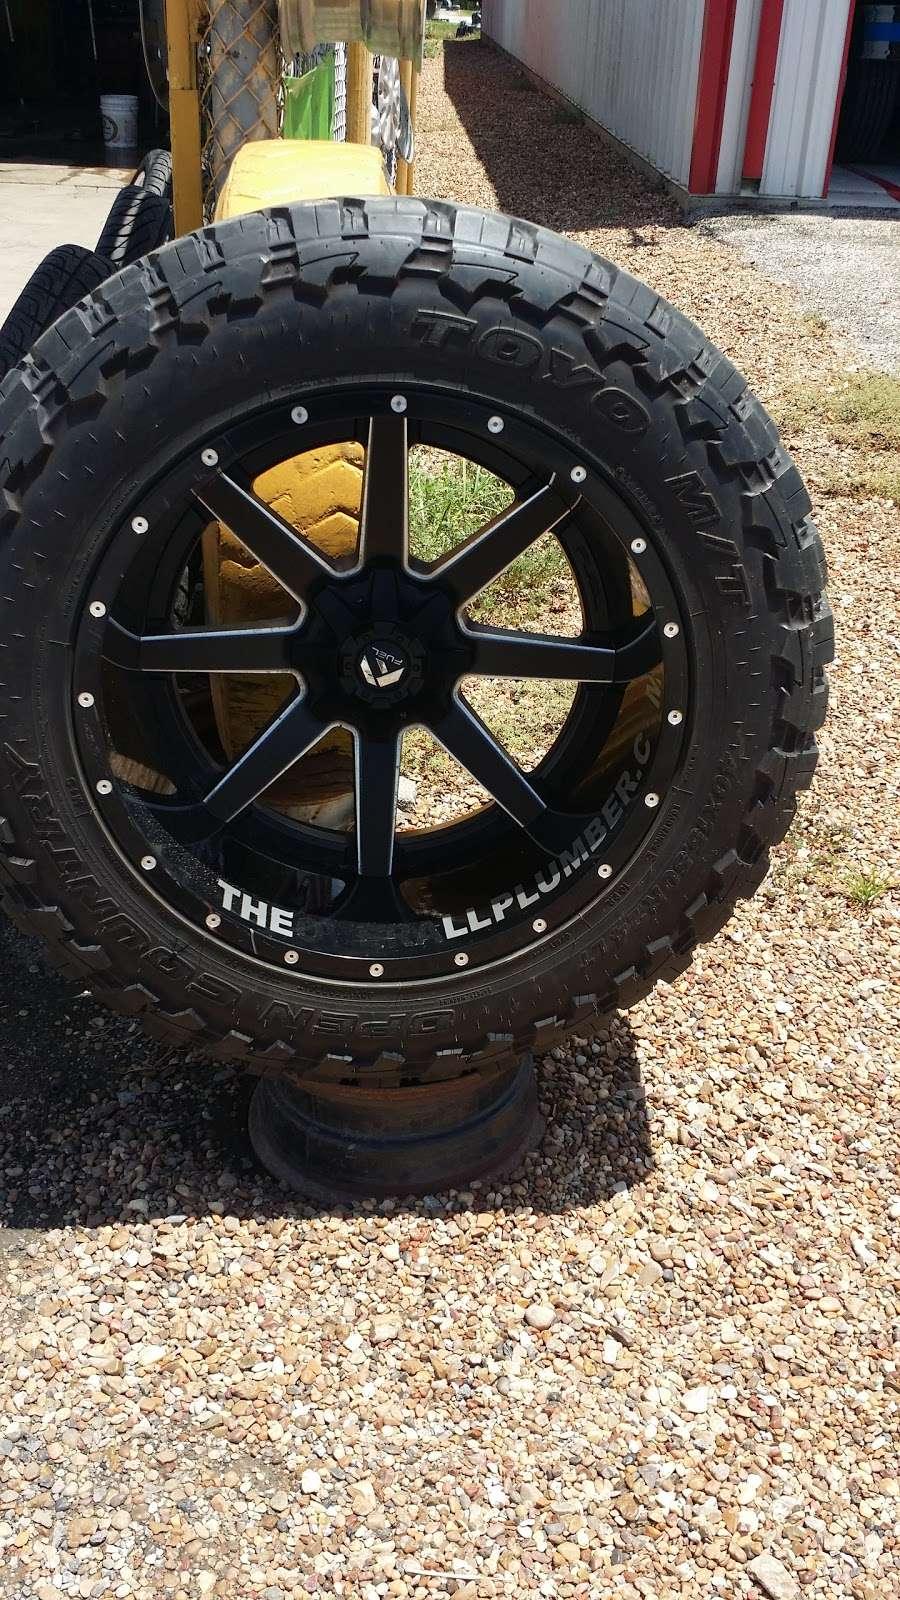 Rodriguez Tire shop - car repair  | Photo 3 of 8 | Address: 16431 FM 521 Rd, Rosharon, TX 77583, USA | Phone: (832) 894-2732